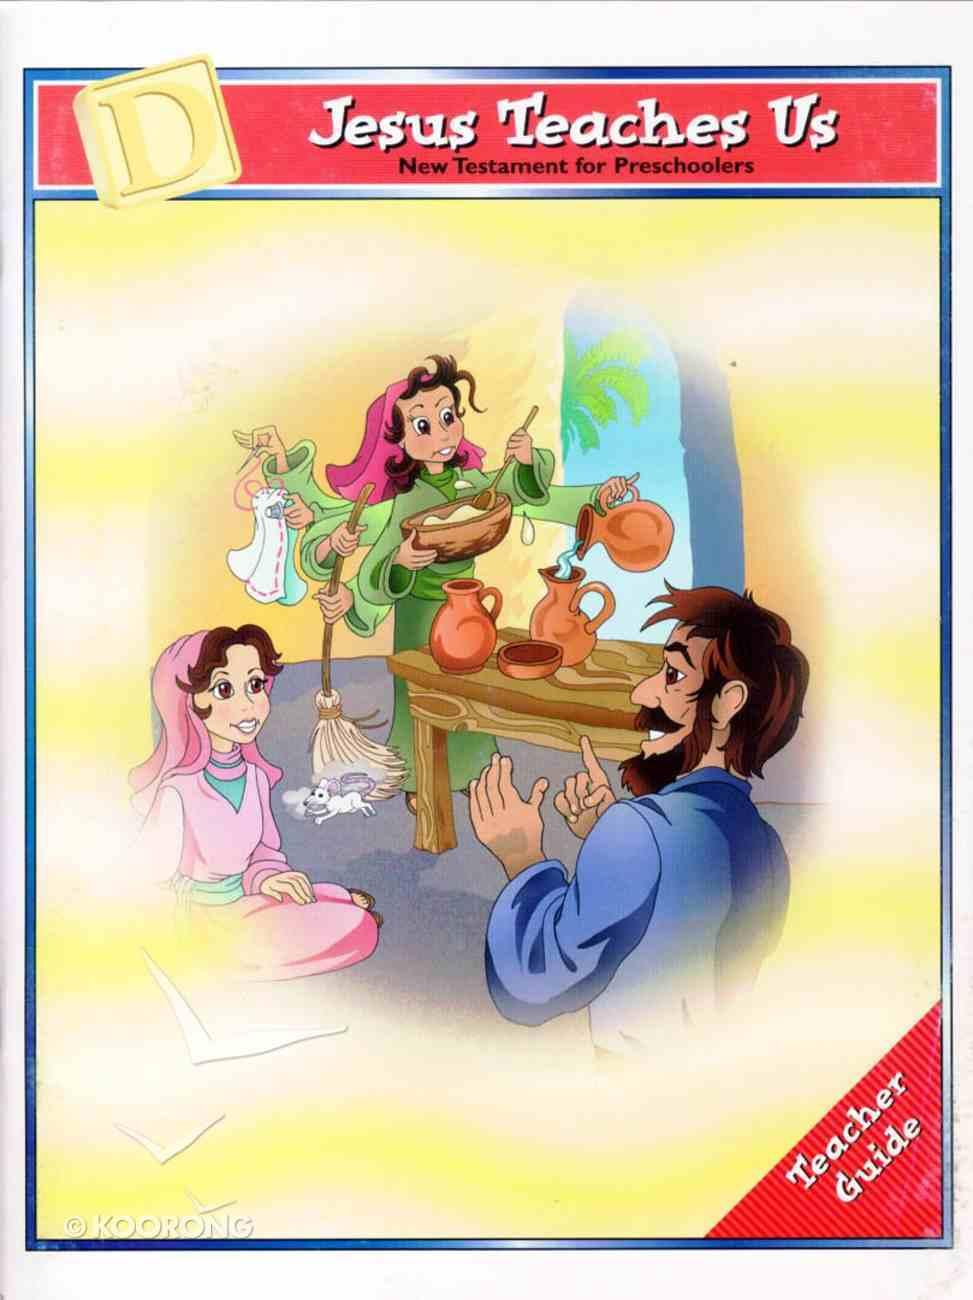 Dlc Preschool: NT, Unit D Ages 2-5 (Teacher) (Discipleland Preschool, Ages 3-5 Series) Paperback